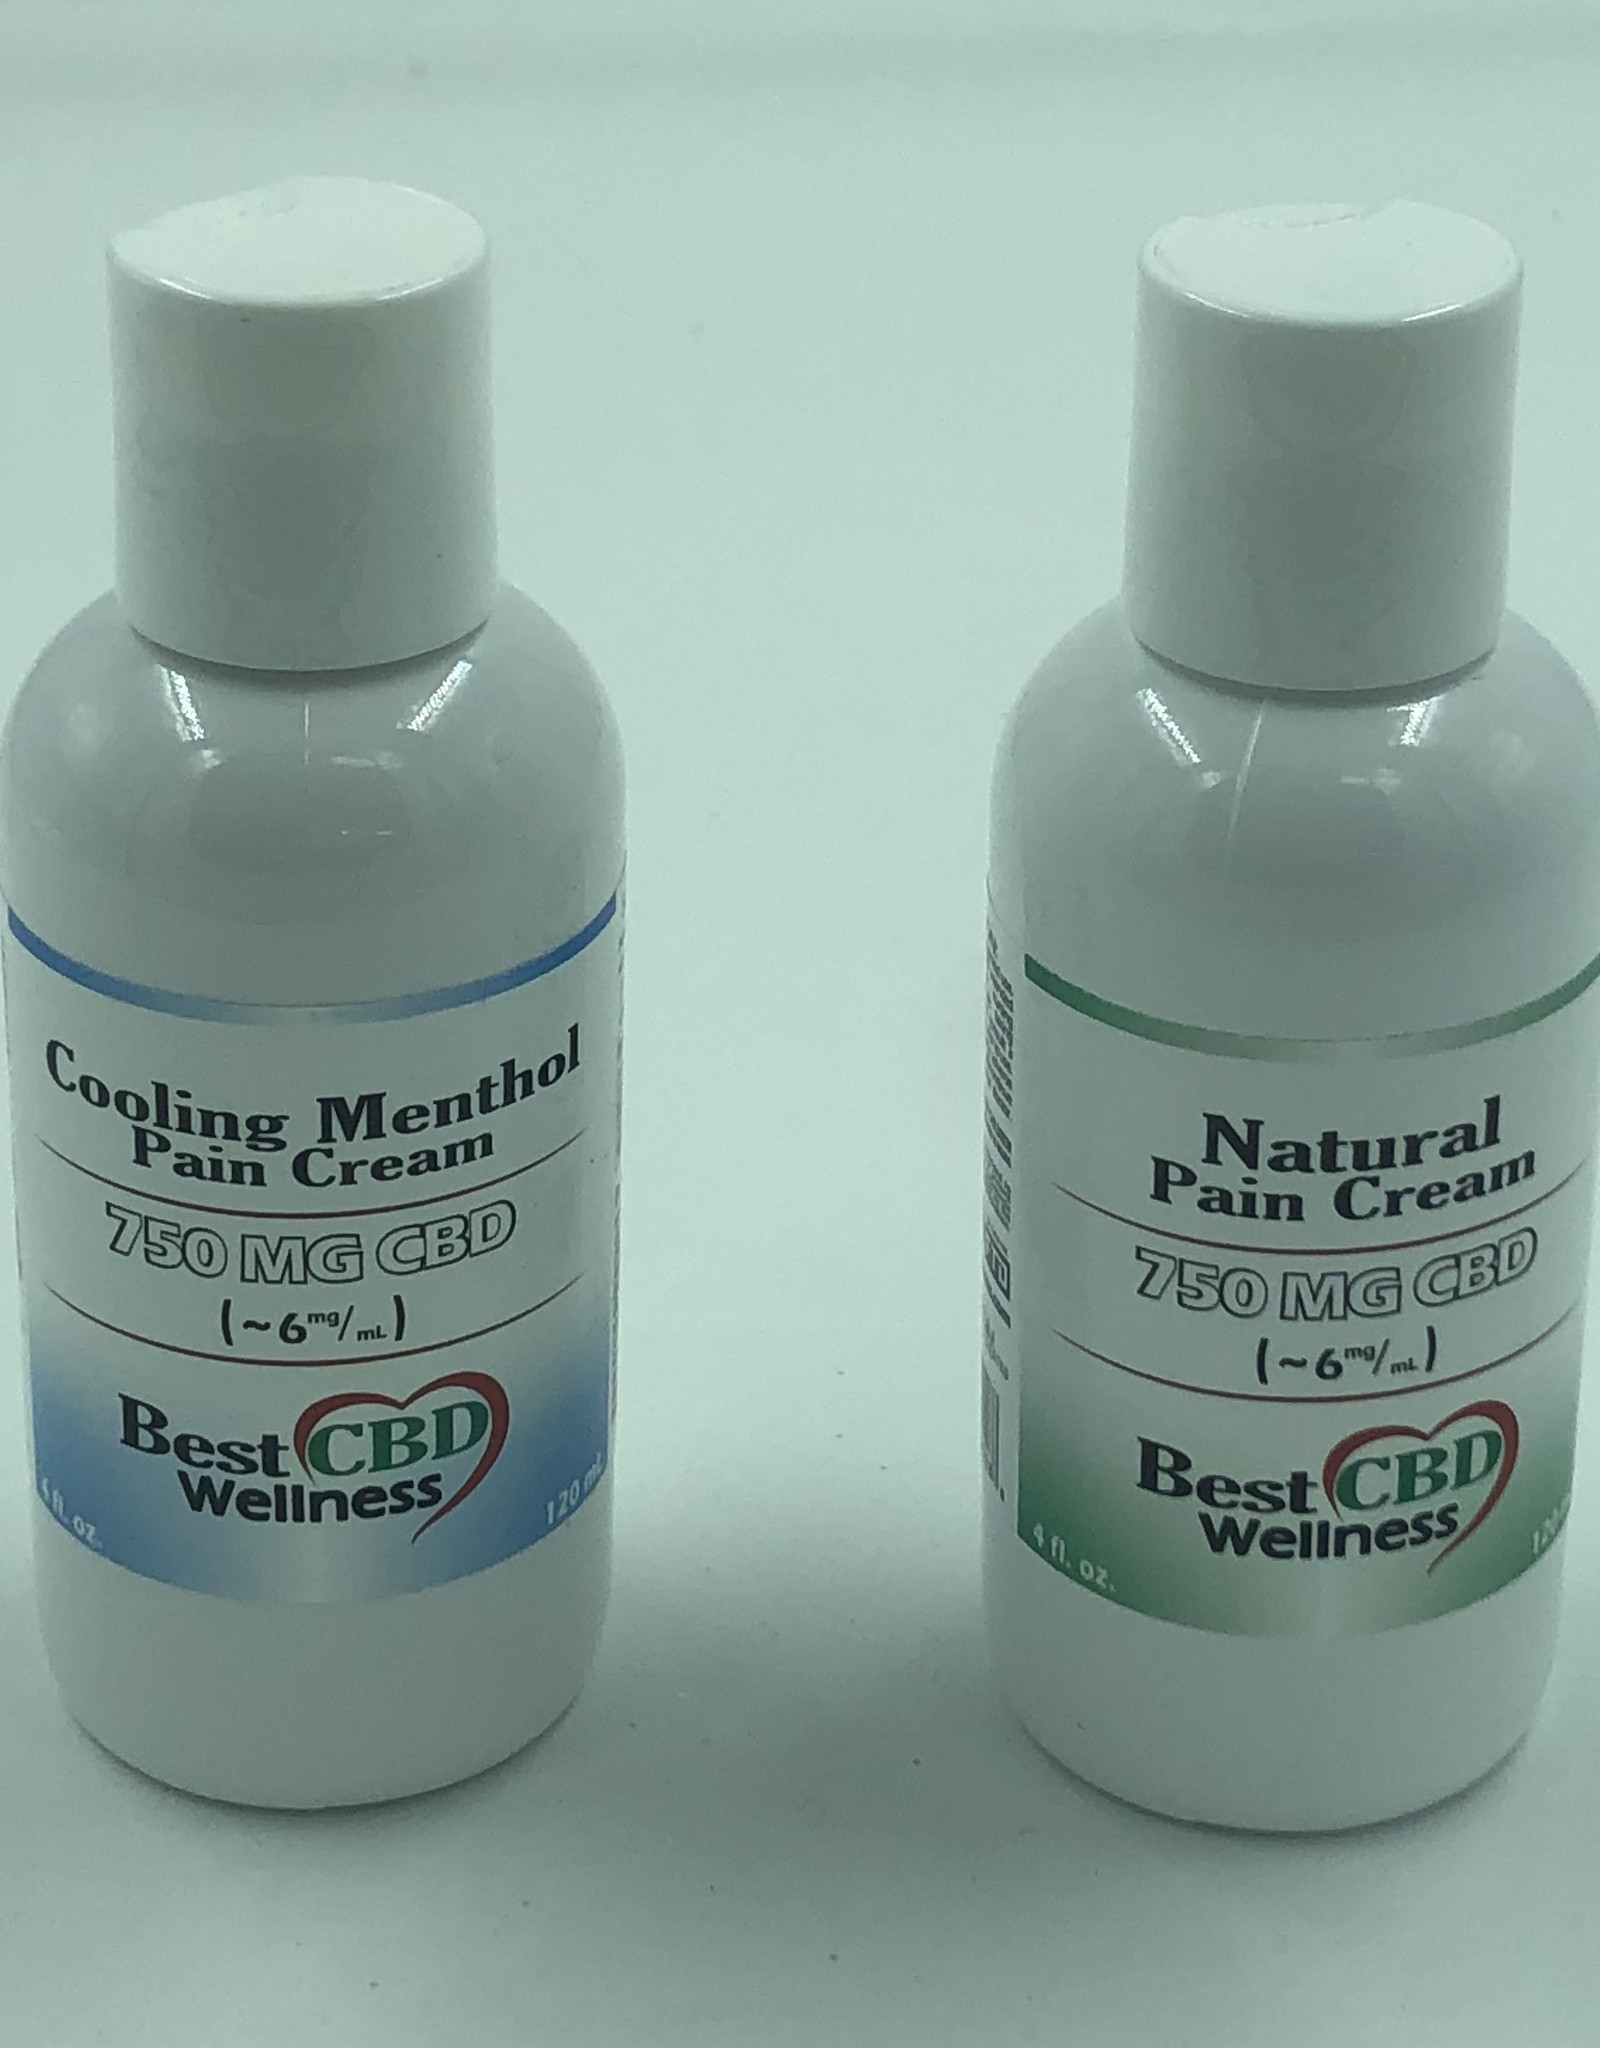 Best CBD Wellness Isolate CBD Menthol Pain Cream 750mg 4oz